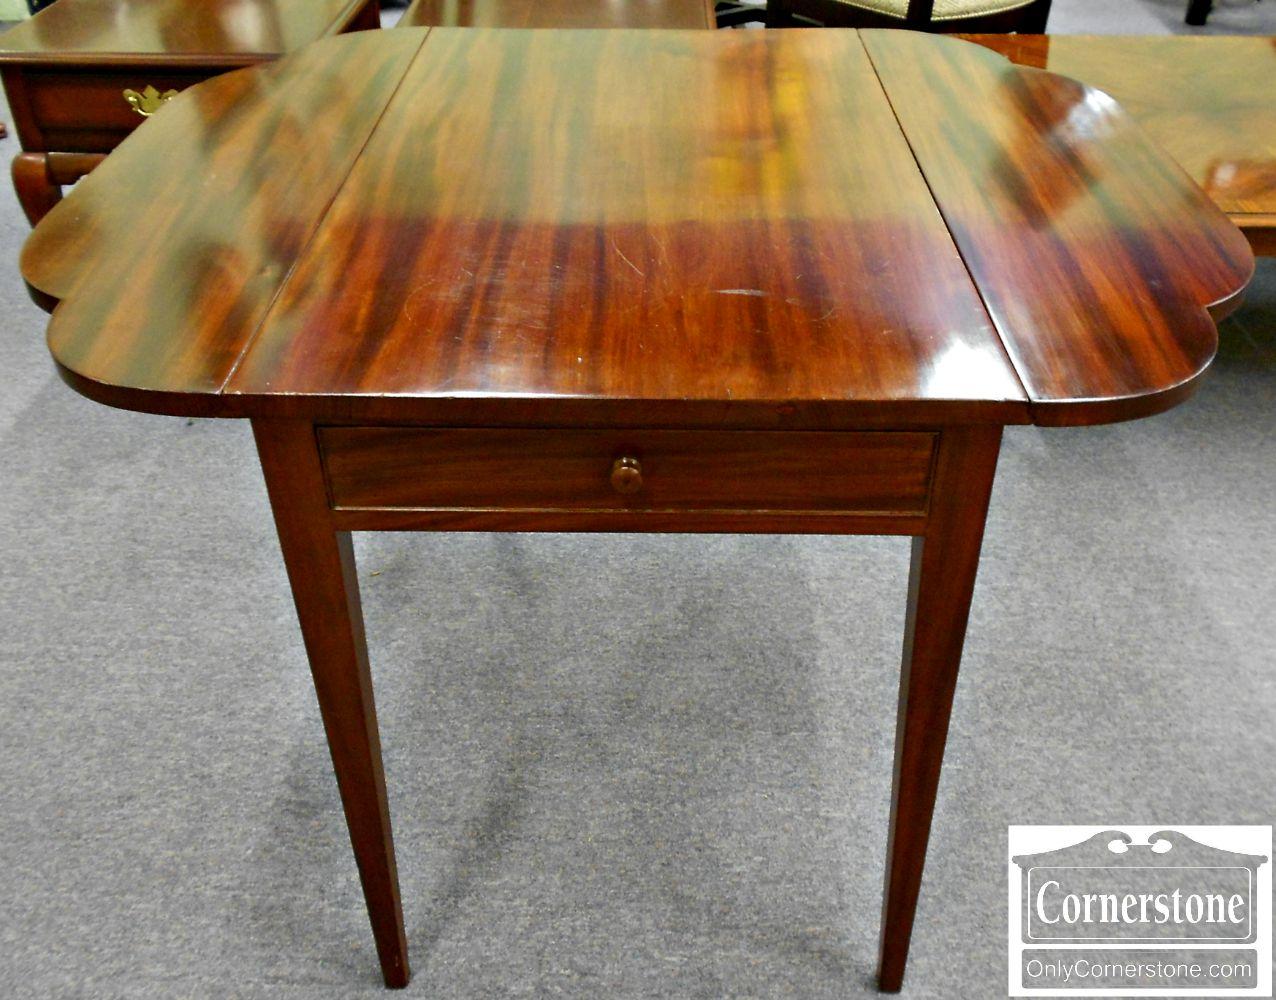 5208-790 Z Antique Solid Mahogany Drop Leaf Table